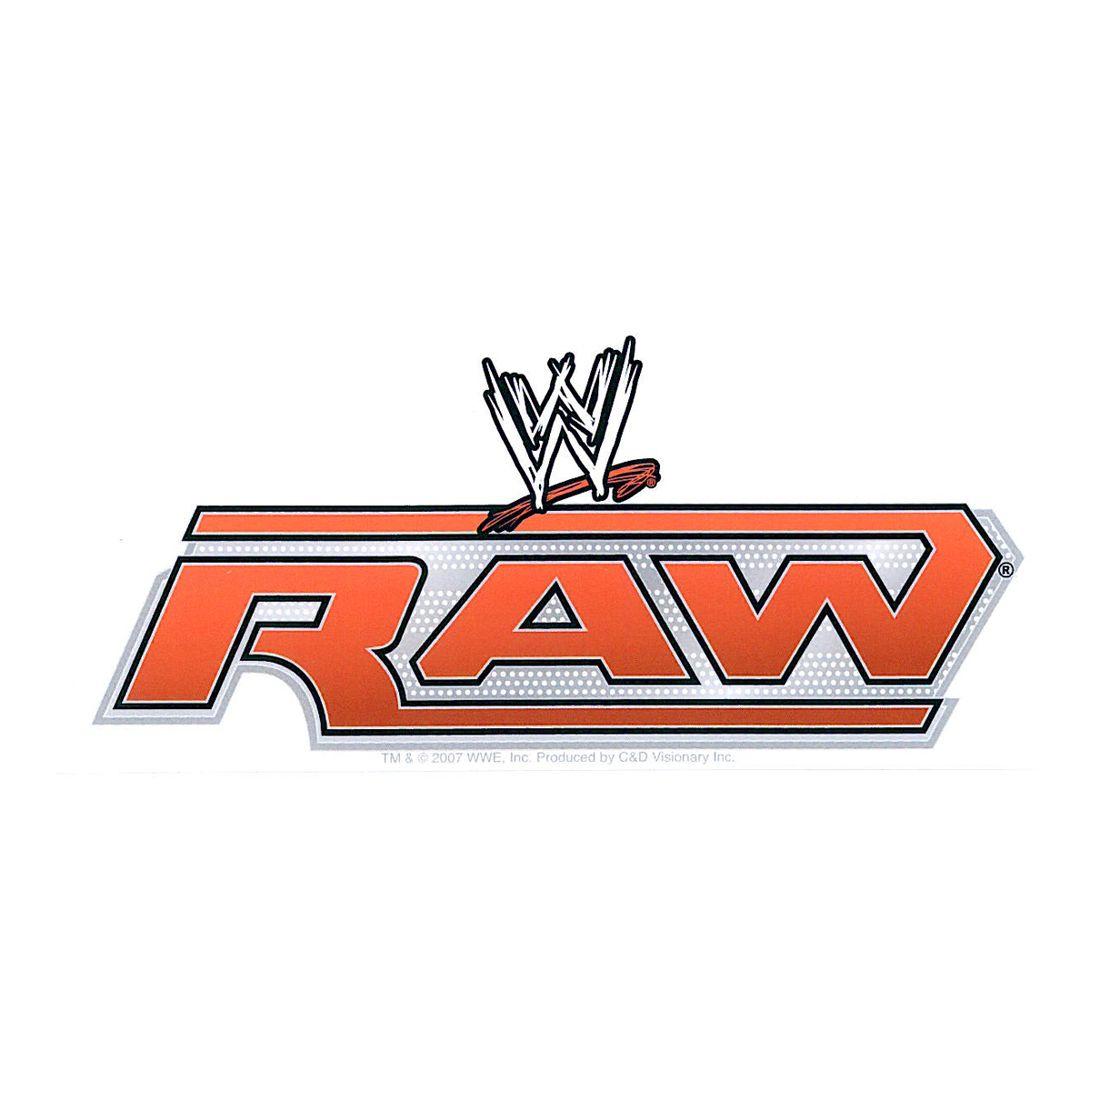 Raw Logo Sticker Clearance 30 Off Logo Sticker Logos Stickers [ 1100 x 1100 Pixel ]